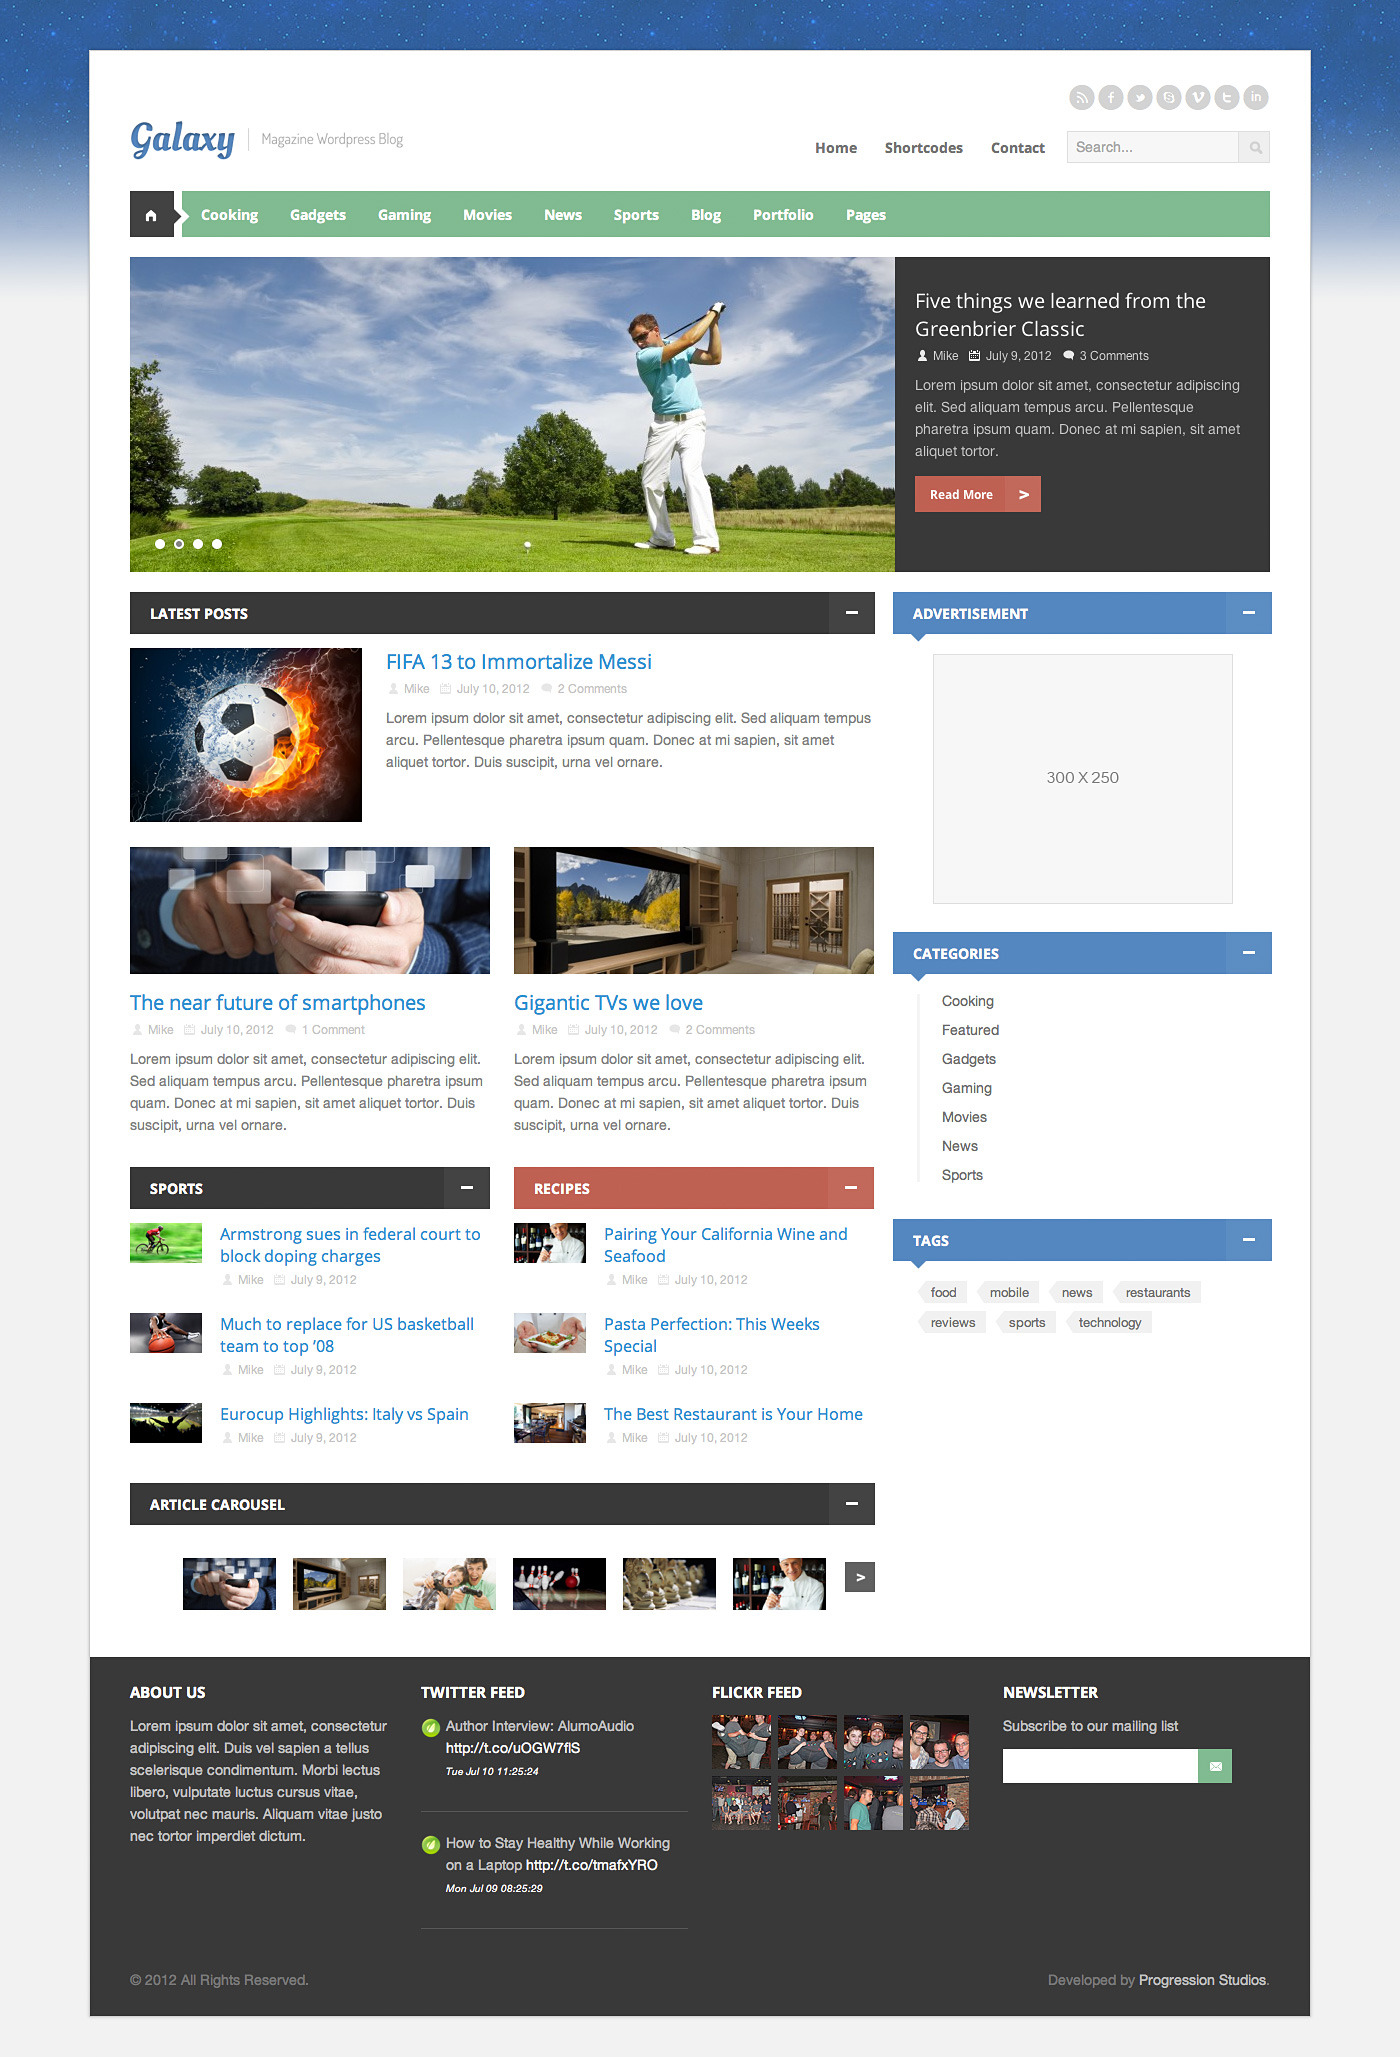 http://3.s3.envato.com/files/35748252/Screenshots/1-Galaxy-Home.jpg